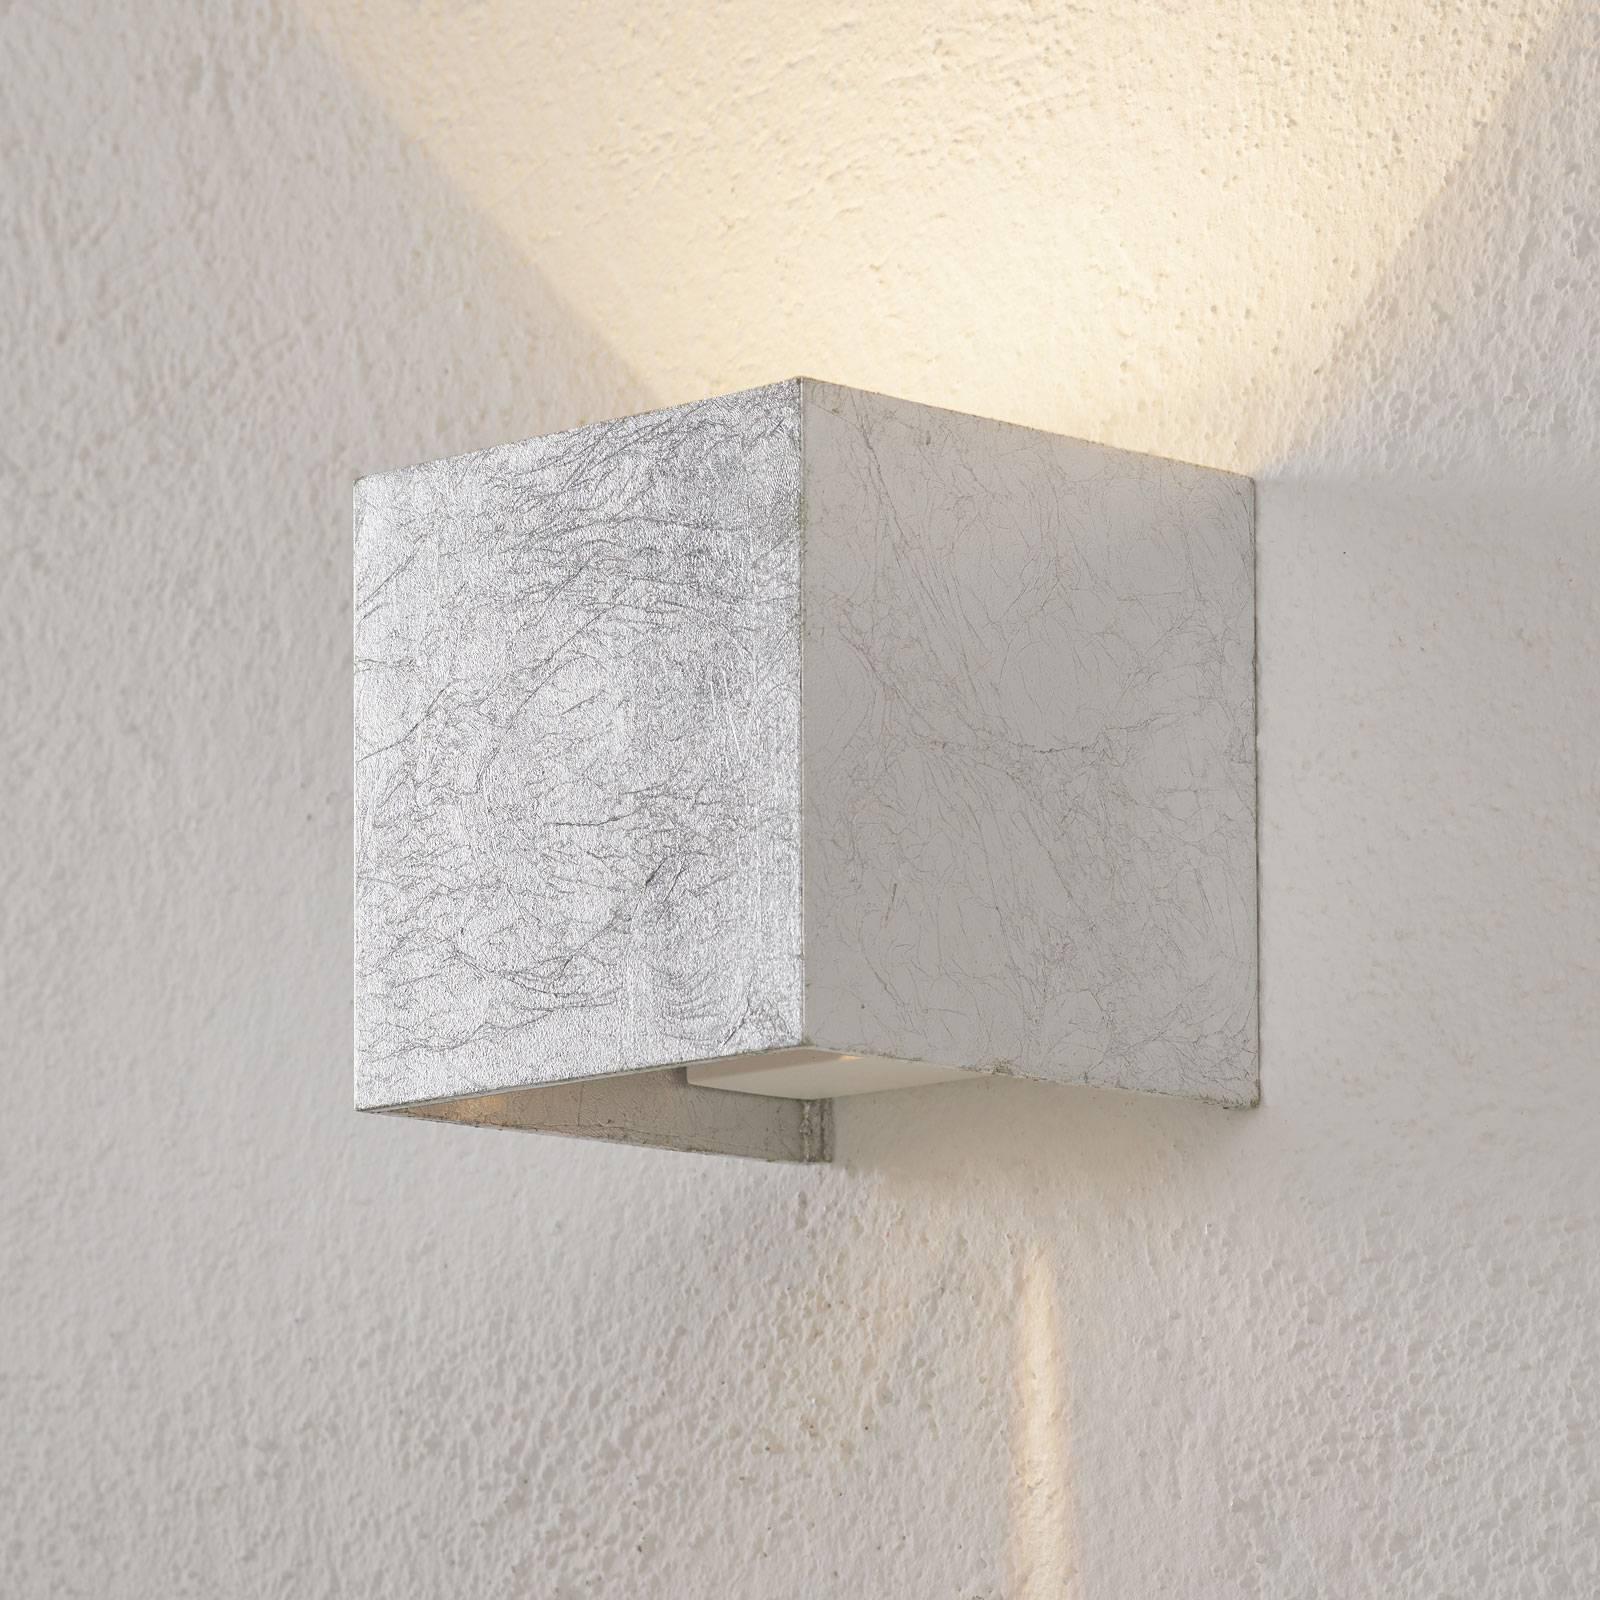 SIRI 44 LED - buitenwandlamp in bladzilver